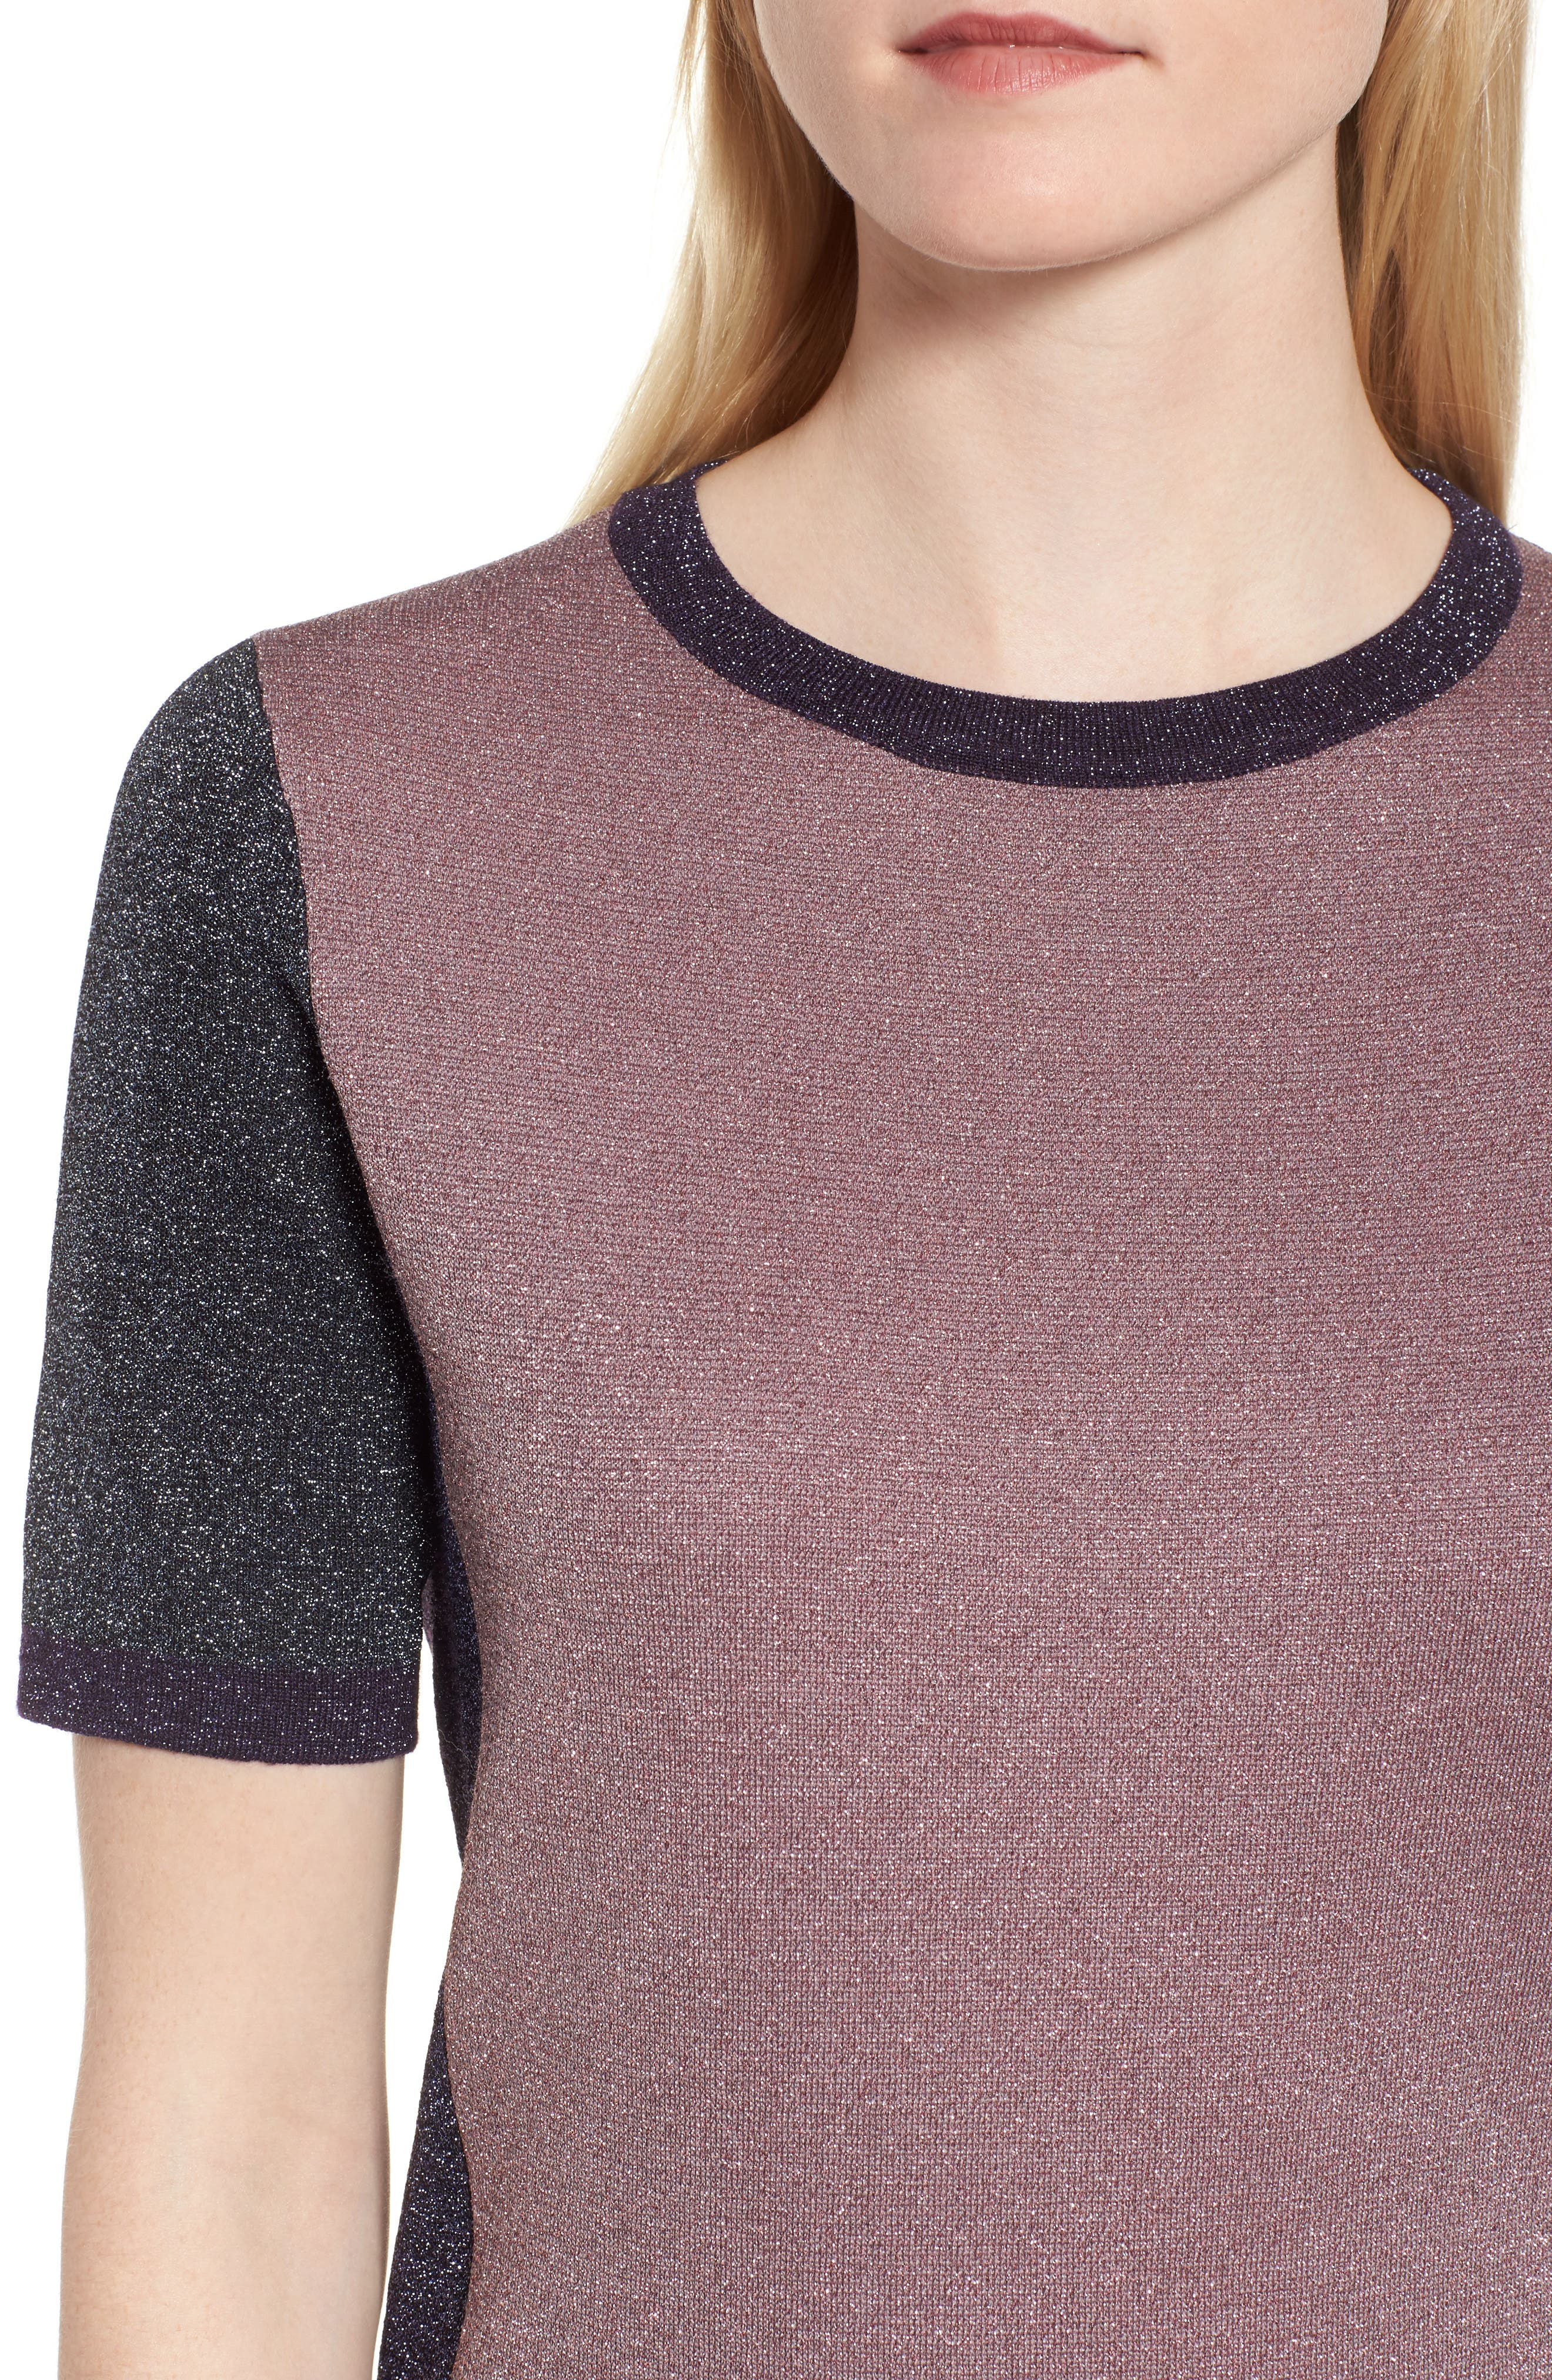 Fifer Sweater,                             Alternate thumbnail 4, color,                             674